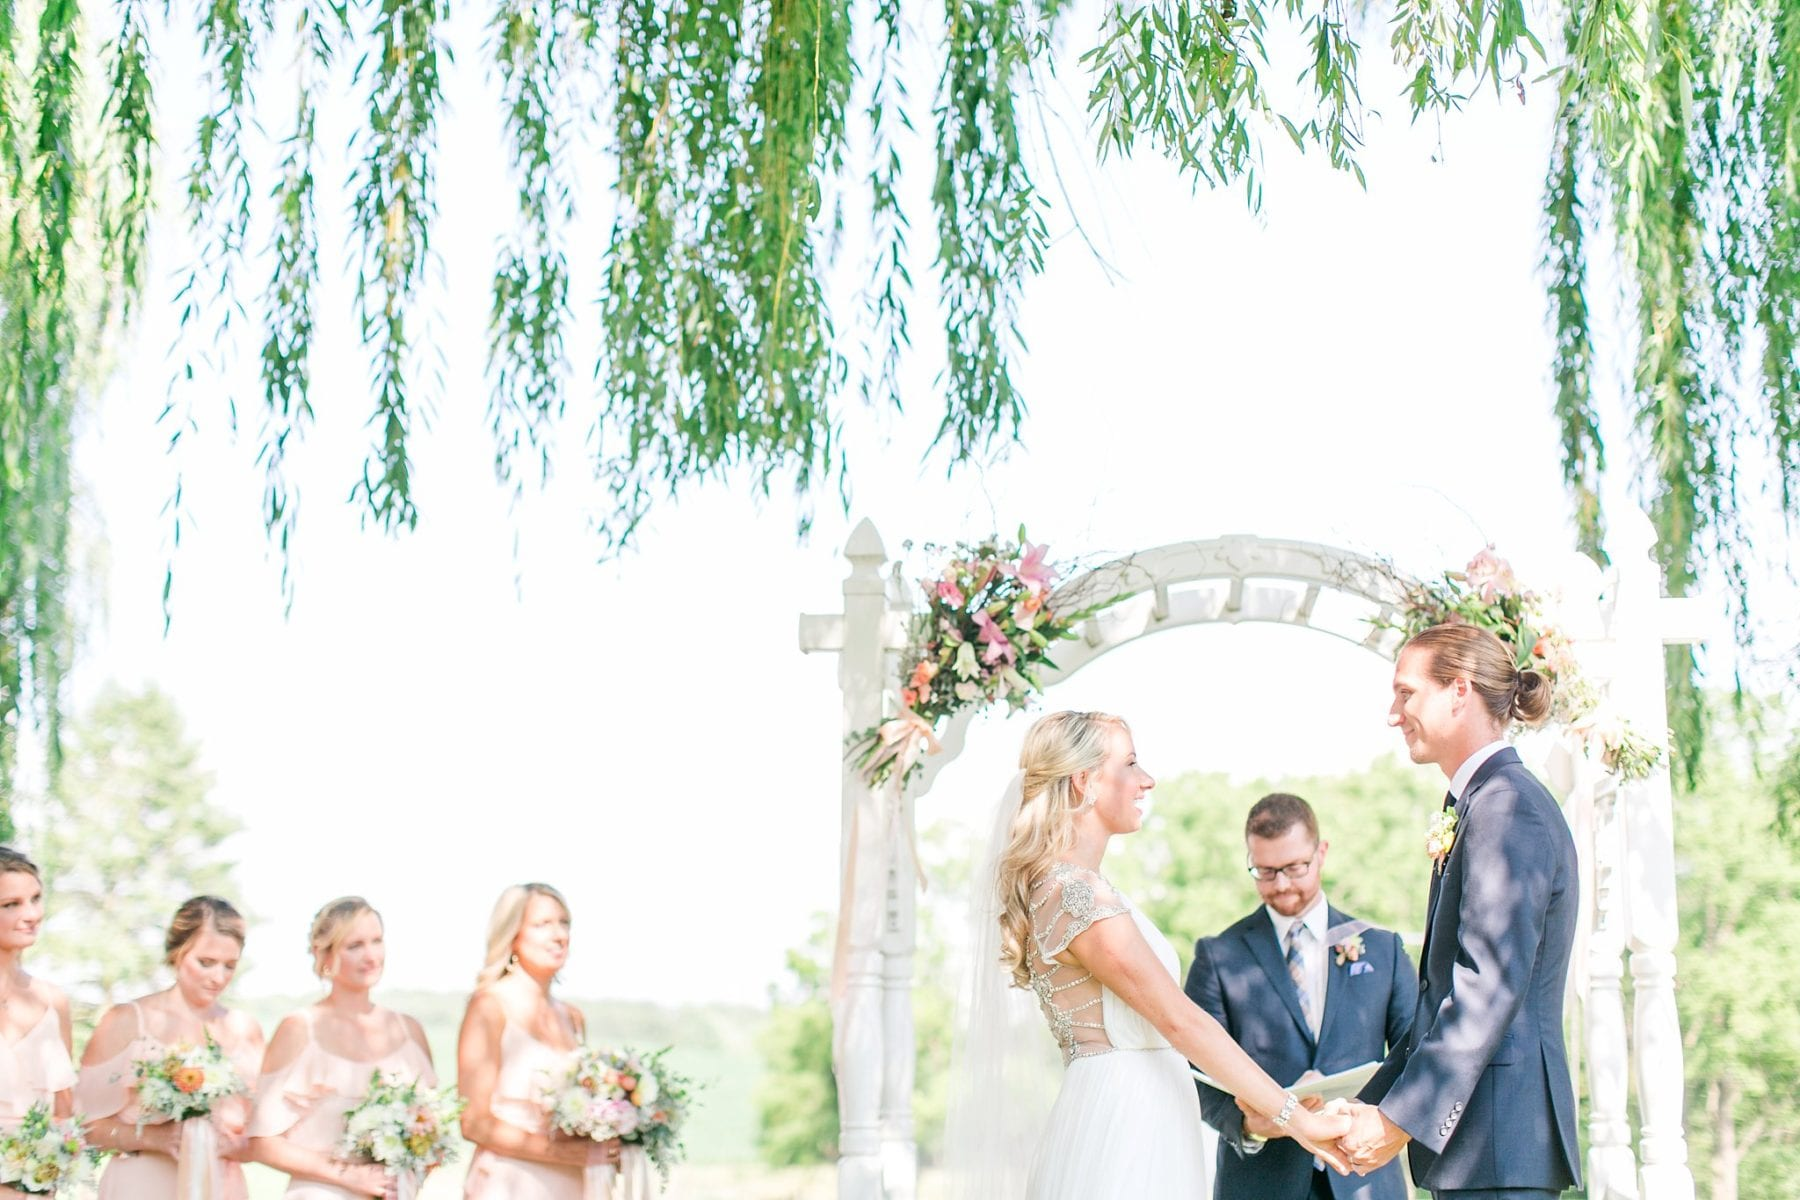 Pond View Farm Wedding Photos Maryland Wedding Photographer Kristen & Ryan Megan Kelsey Photography Blog-128.jpg